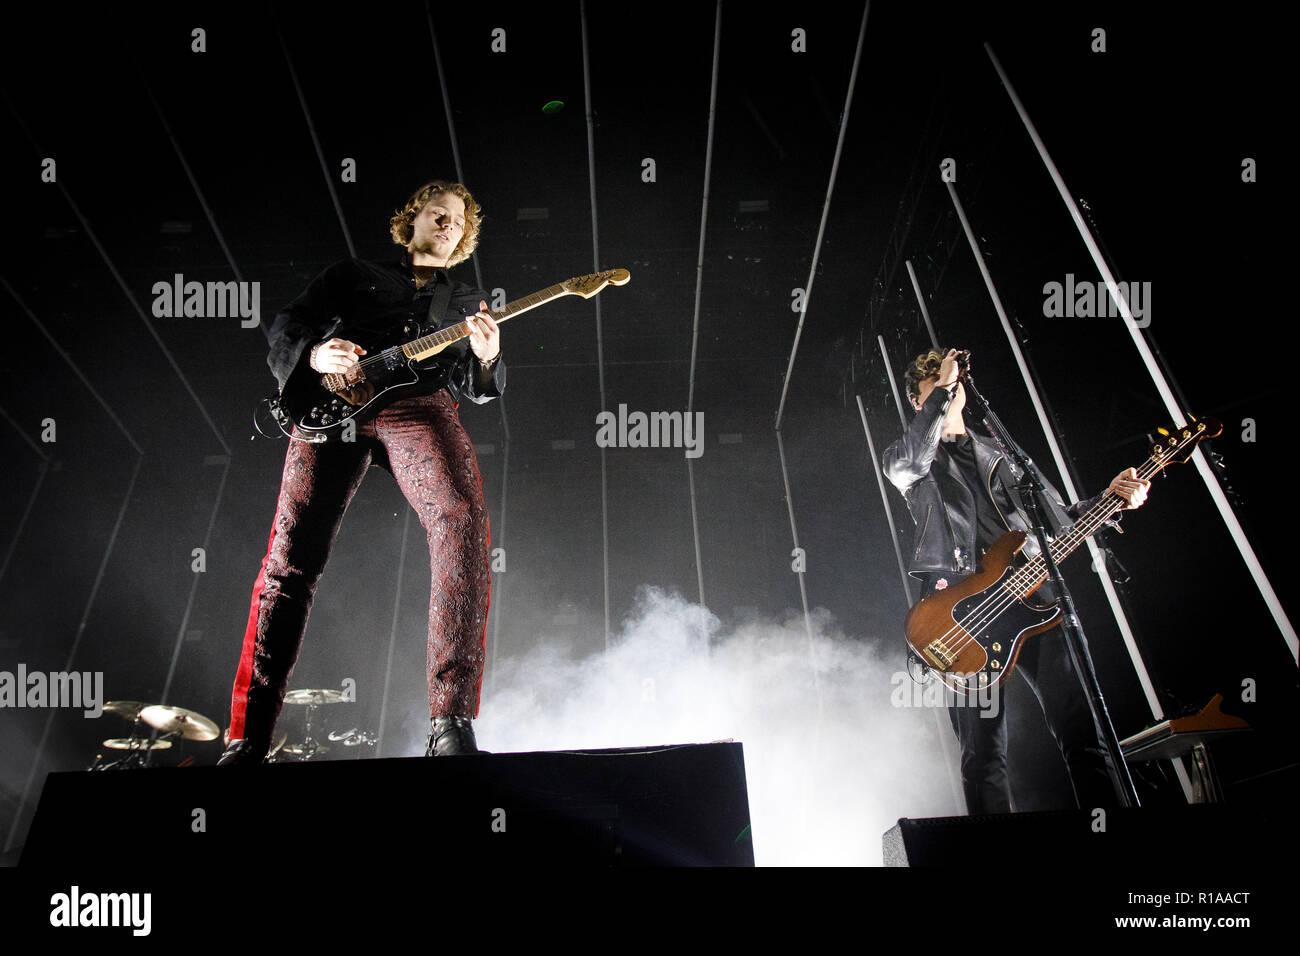 Denmark Copenh November 8 2018 The Australian Pop Rock Band 5 Seconds Of Summer Performs A Live Concert At Forum Black Box In Copenh